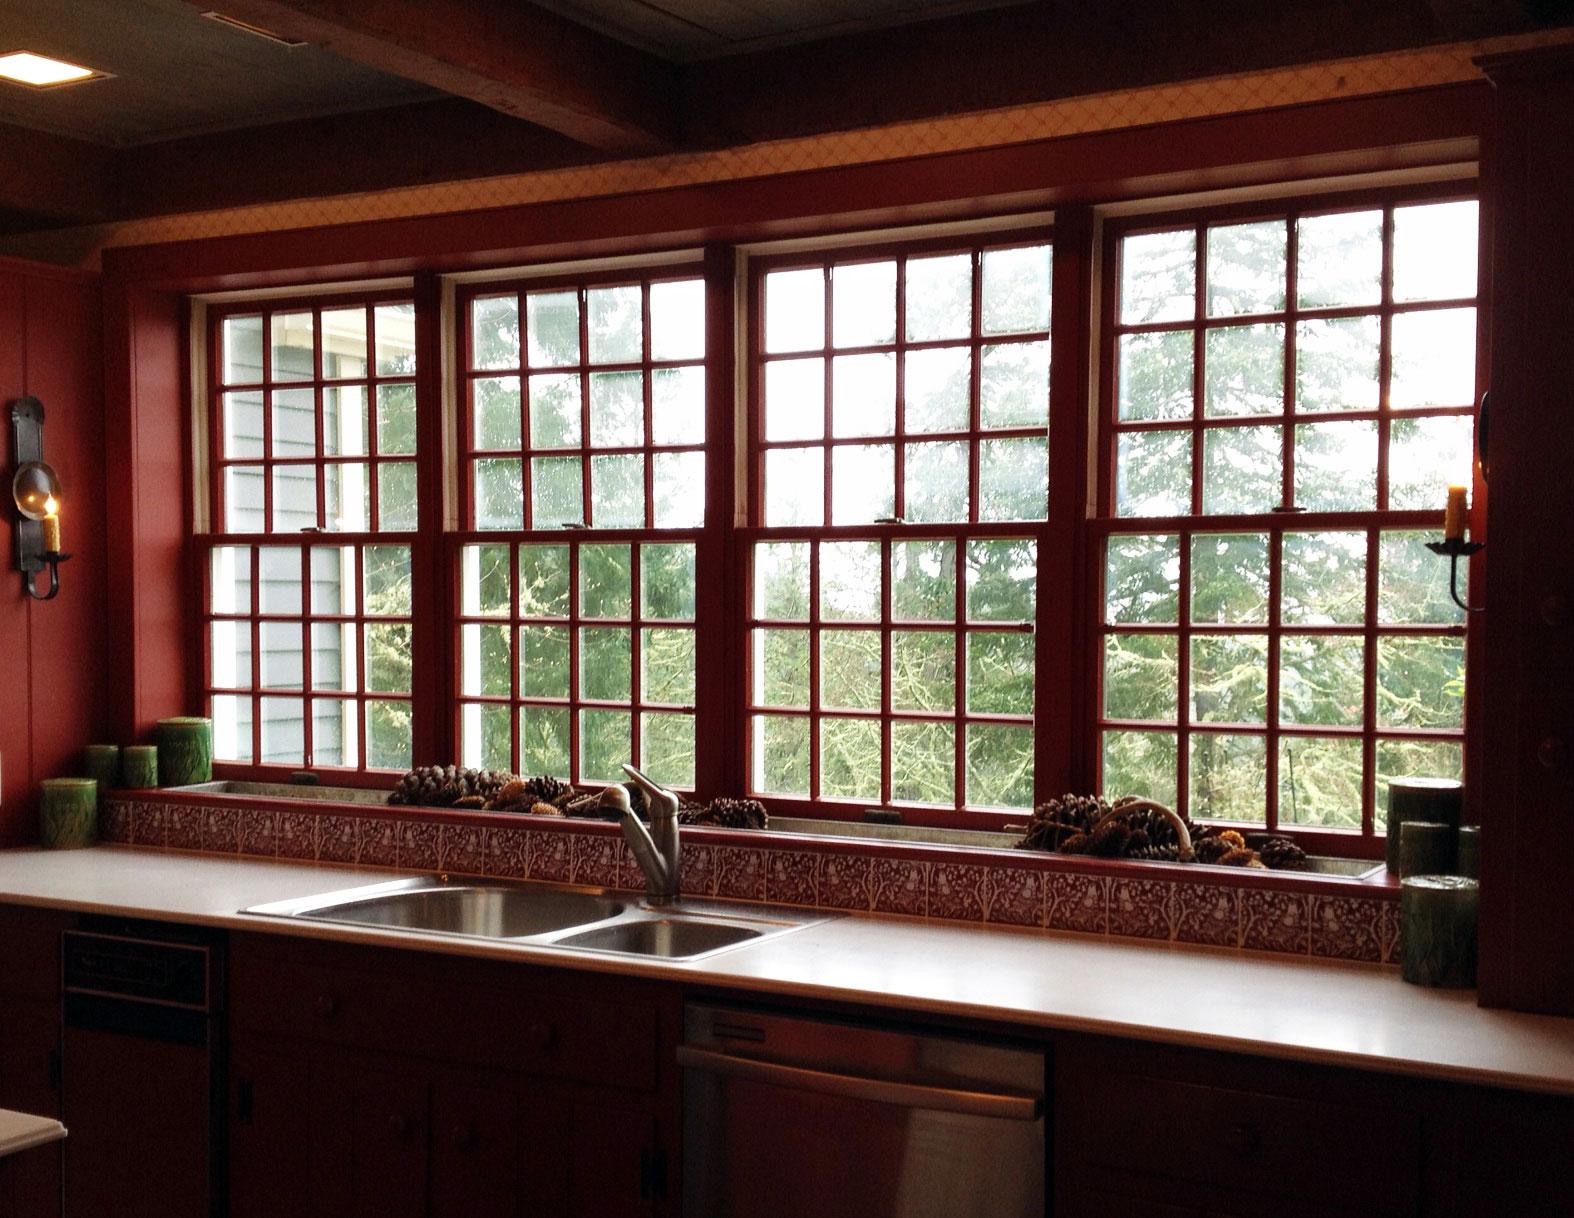 William Morris Brother Rabbit bird tiles under a sunny window in Eugene, Oregon kitchen